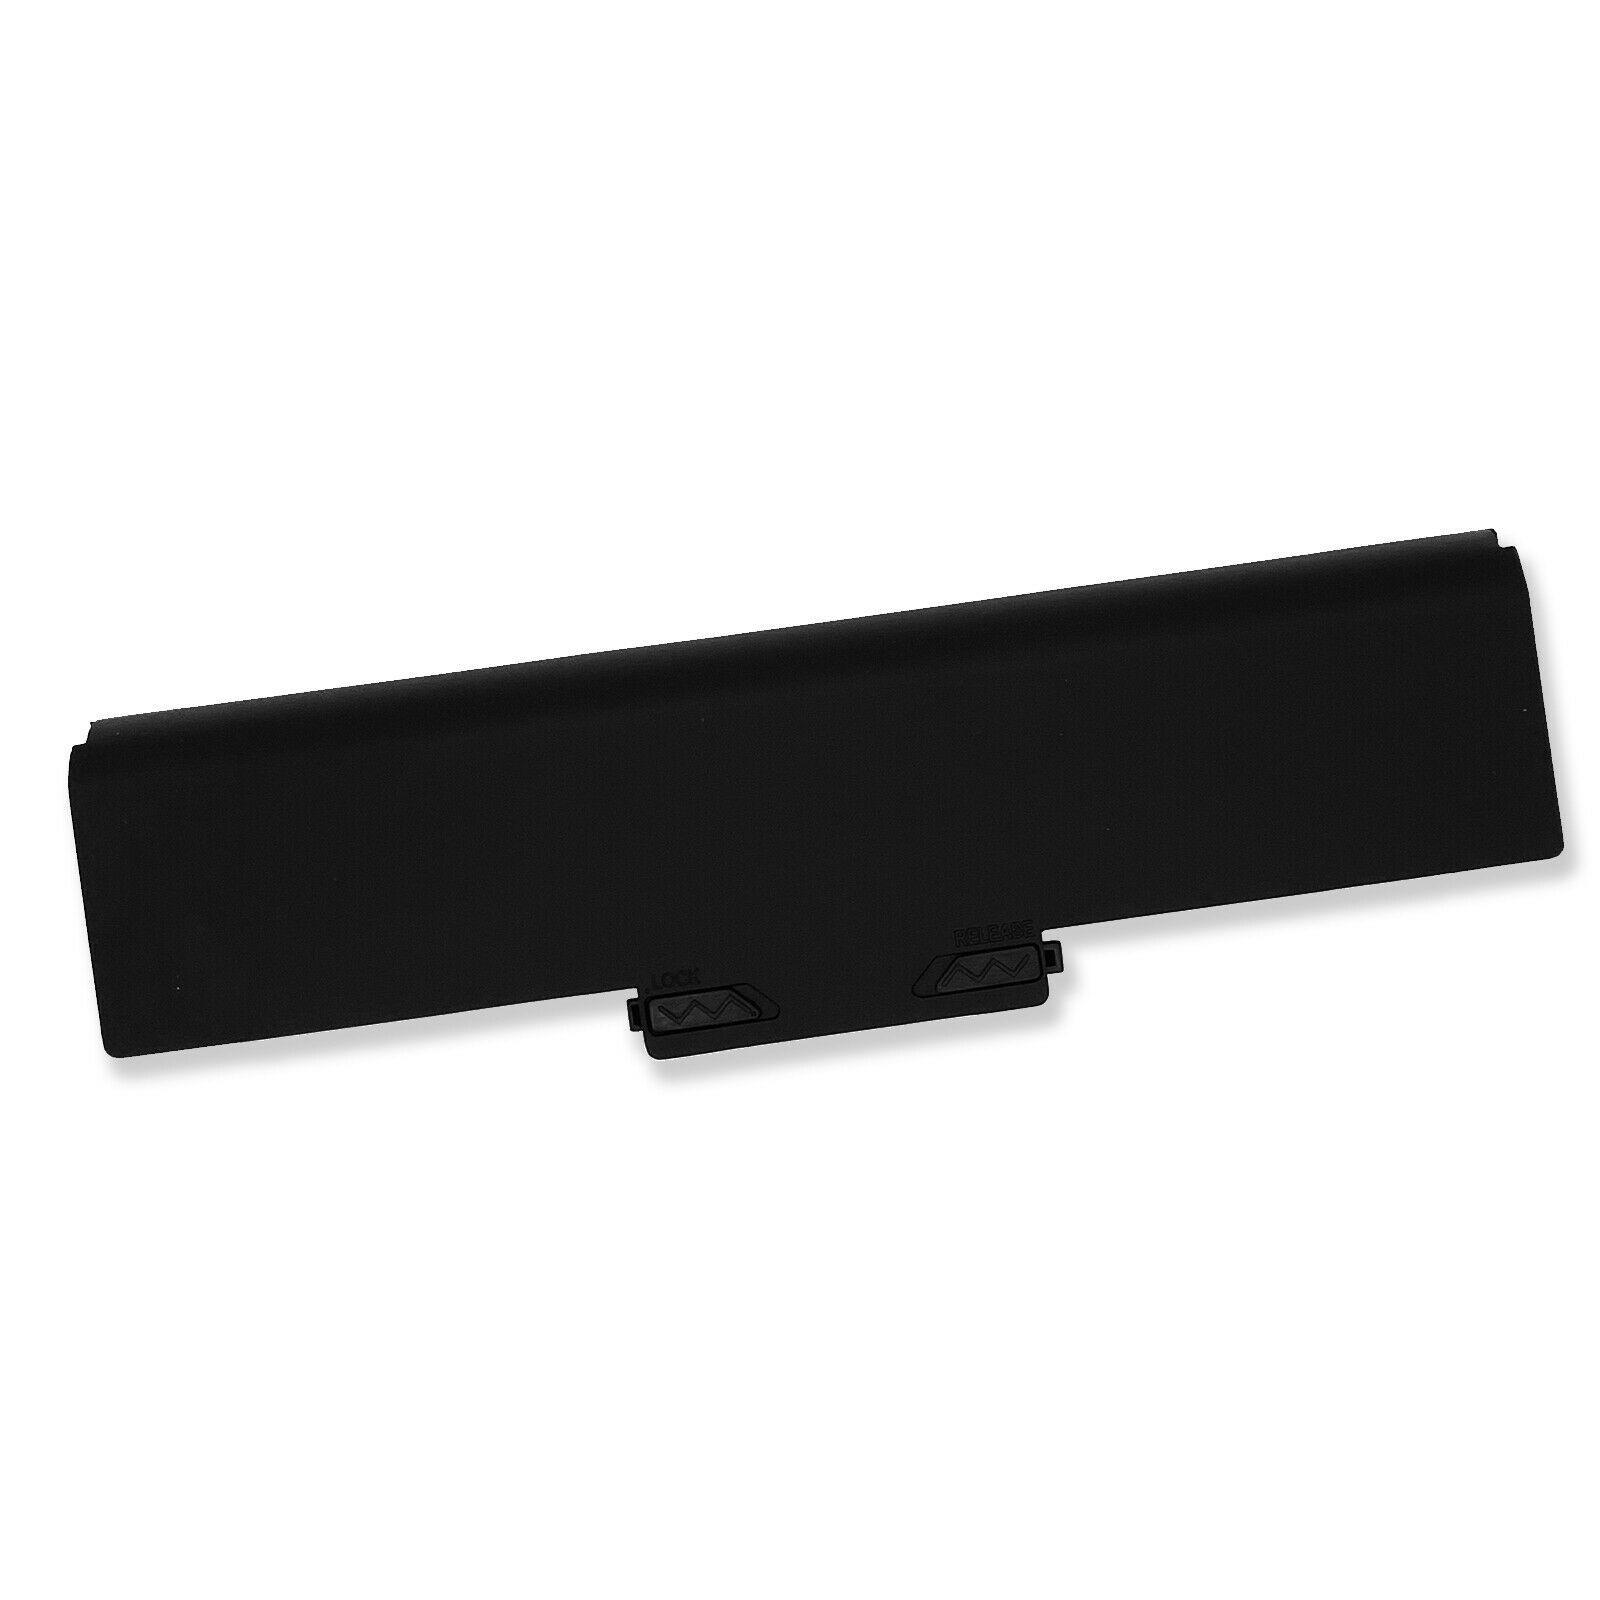 Bateria Para Sony Vaio Vgp-bpl13 Vgp-bps13a/r Vgp-bps13 - EASY HELP NOTE